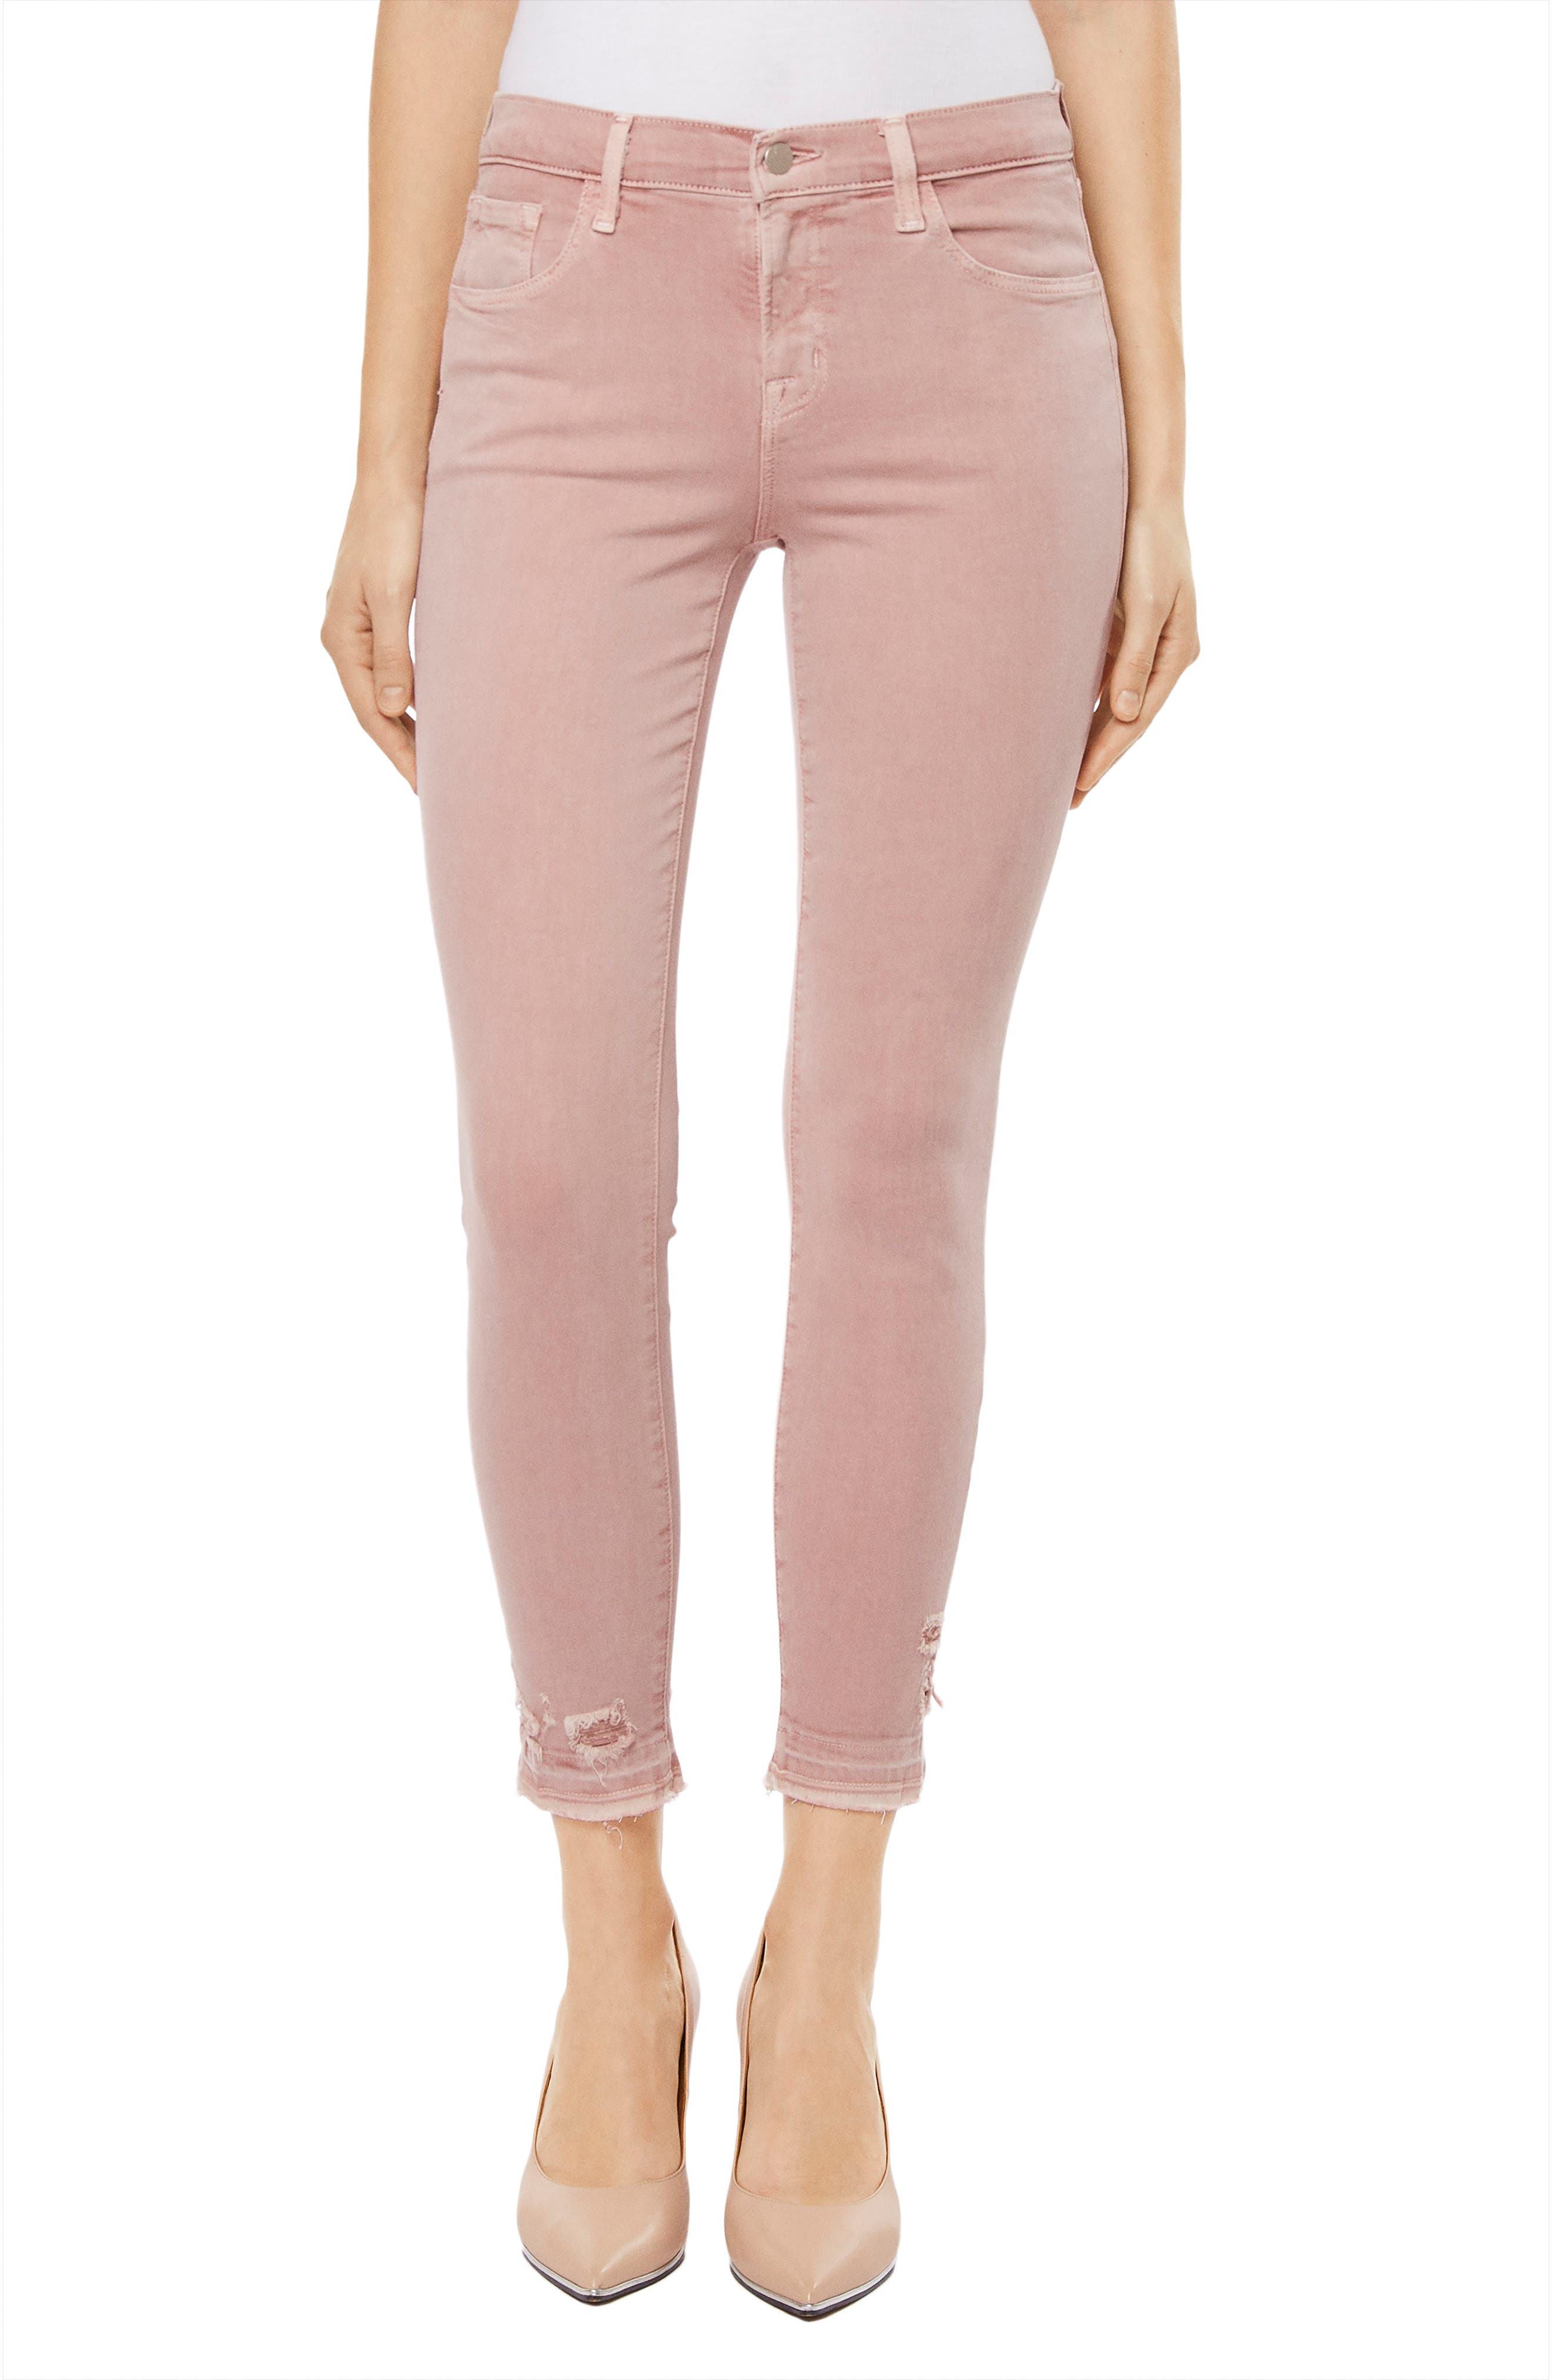 835 Capri Skinny Jeans,                             Main thumbnail 1, color,                             Vinca Destruct